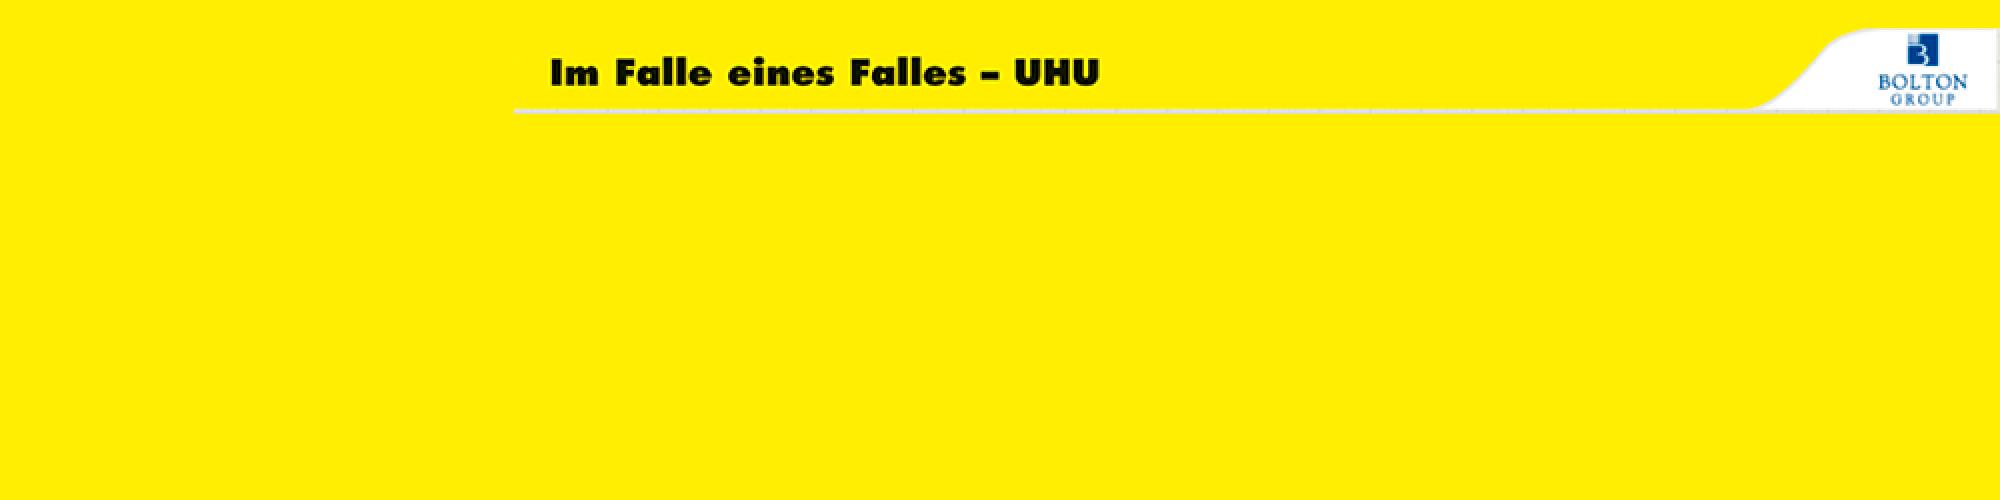 UHU Austria Ges.m.b.H.